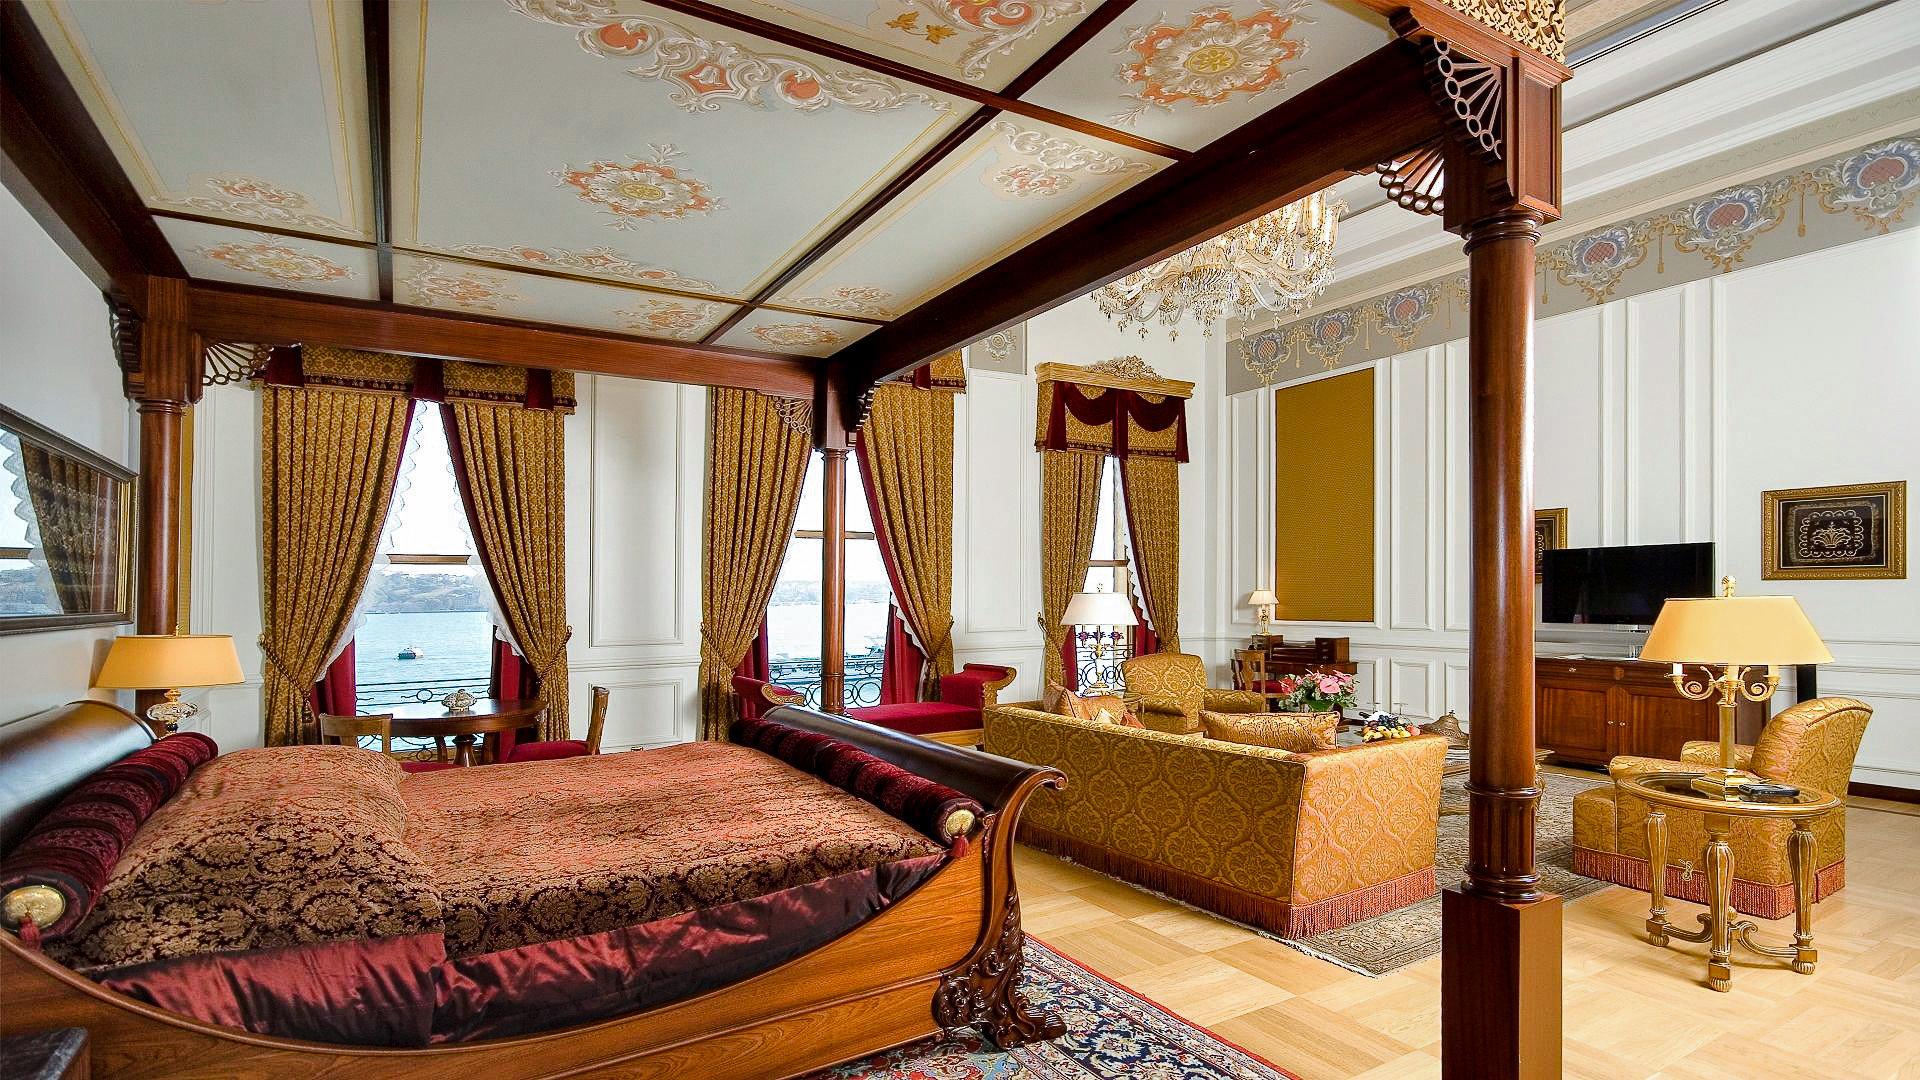 Boutique Hotels Hotels Luxury Travel indoor room ceiling interior design Suite estate real estate hotel Bedroom decorated furniture